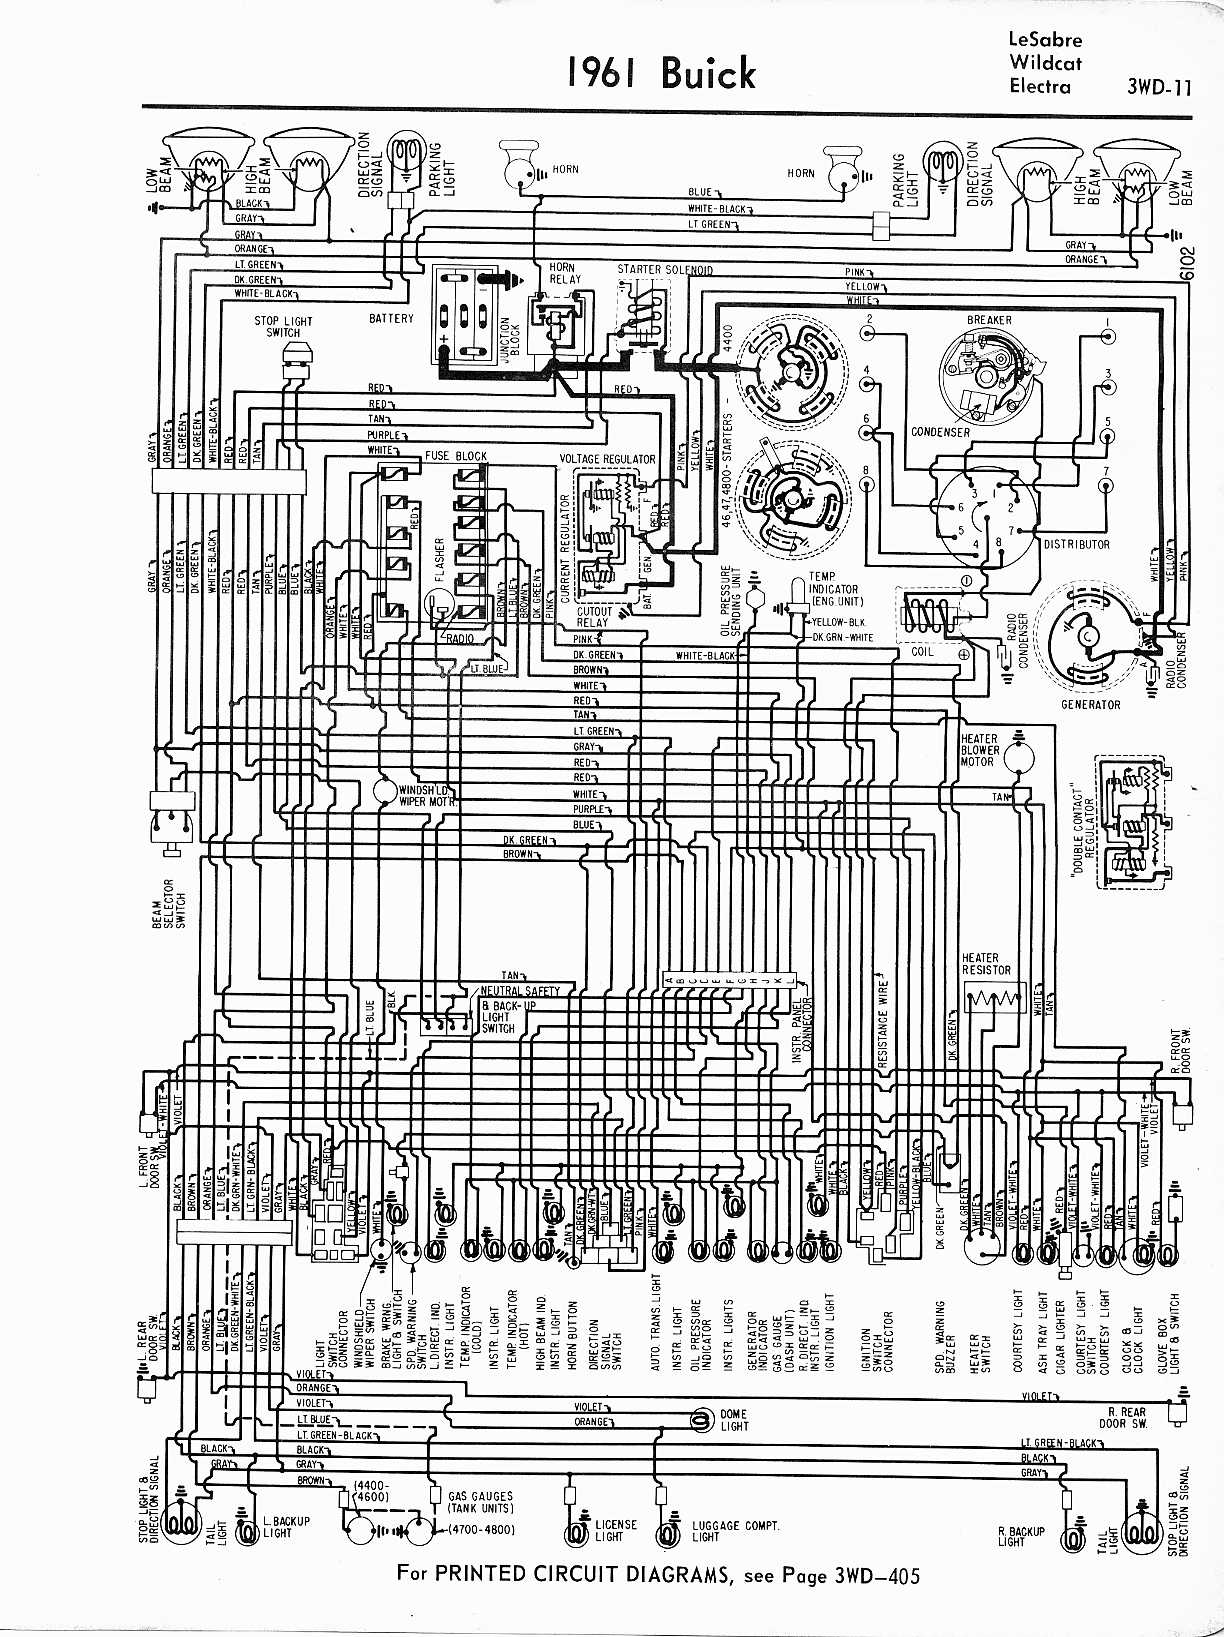 [DIAGRAM_5NL]  WK_9333] 2005 Buick Lesabre Engine Diagram Wiring Diagram | 1998 Buick Regal Ls Wiring Schematic |  | Stica Stica Trons Mohammedshrine Librar Wiring 101